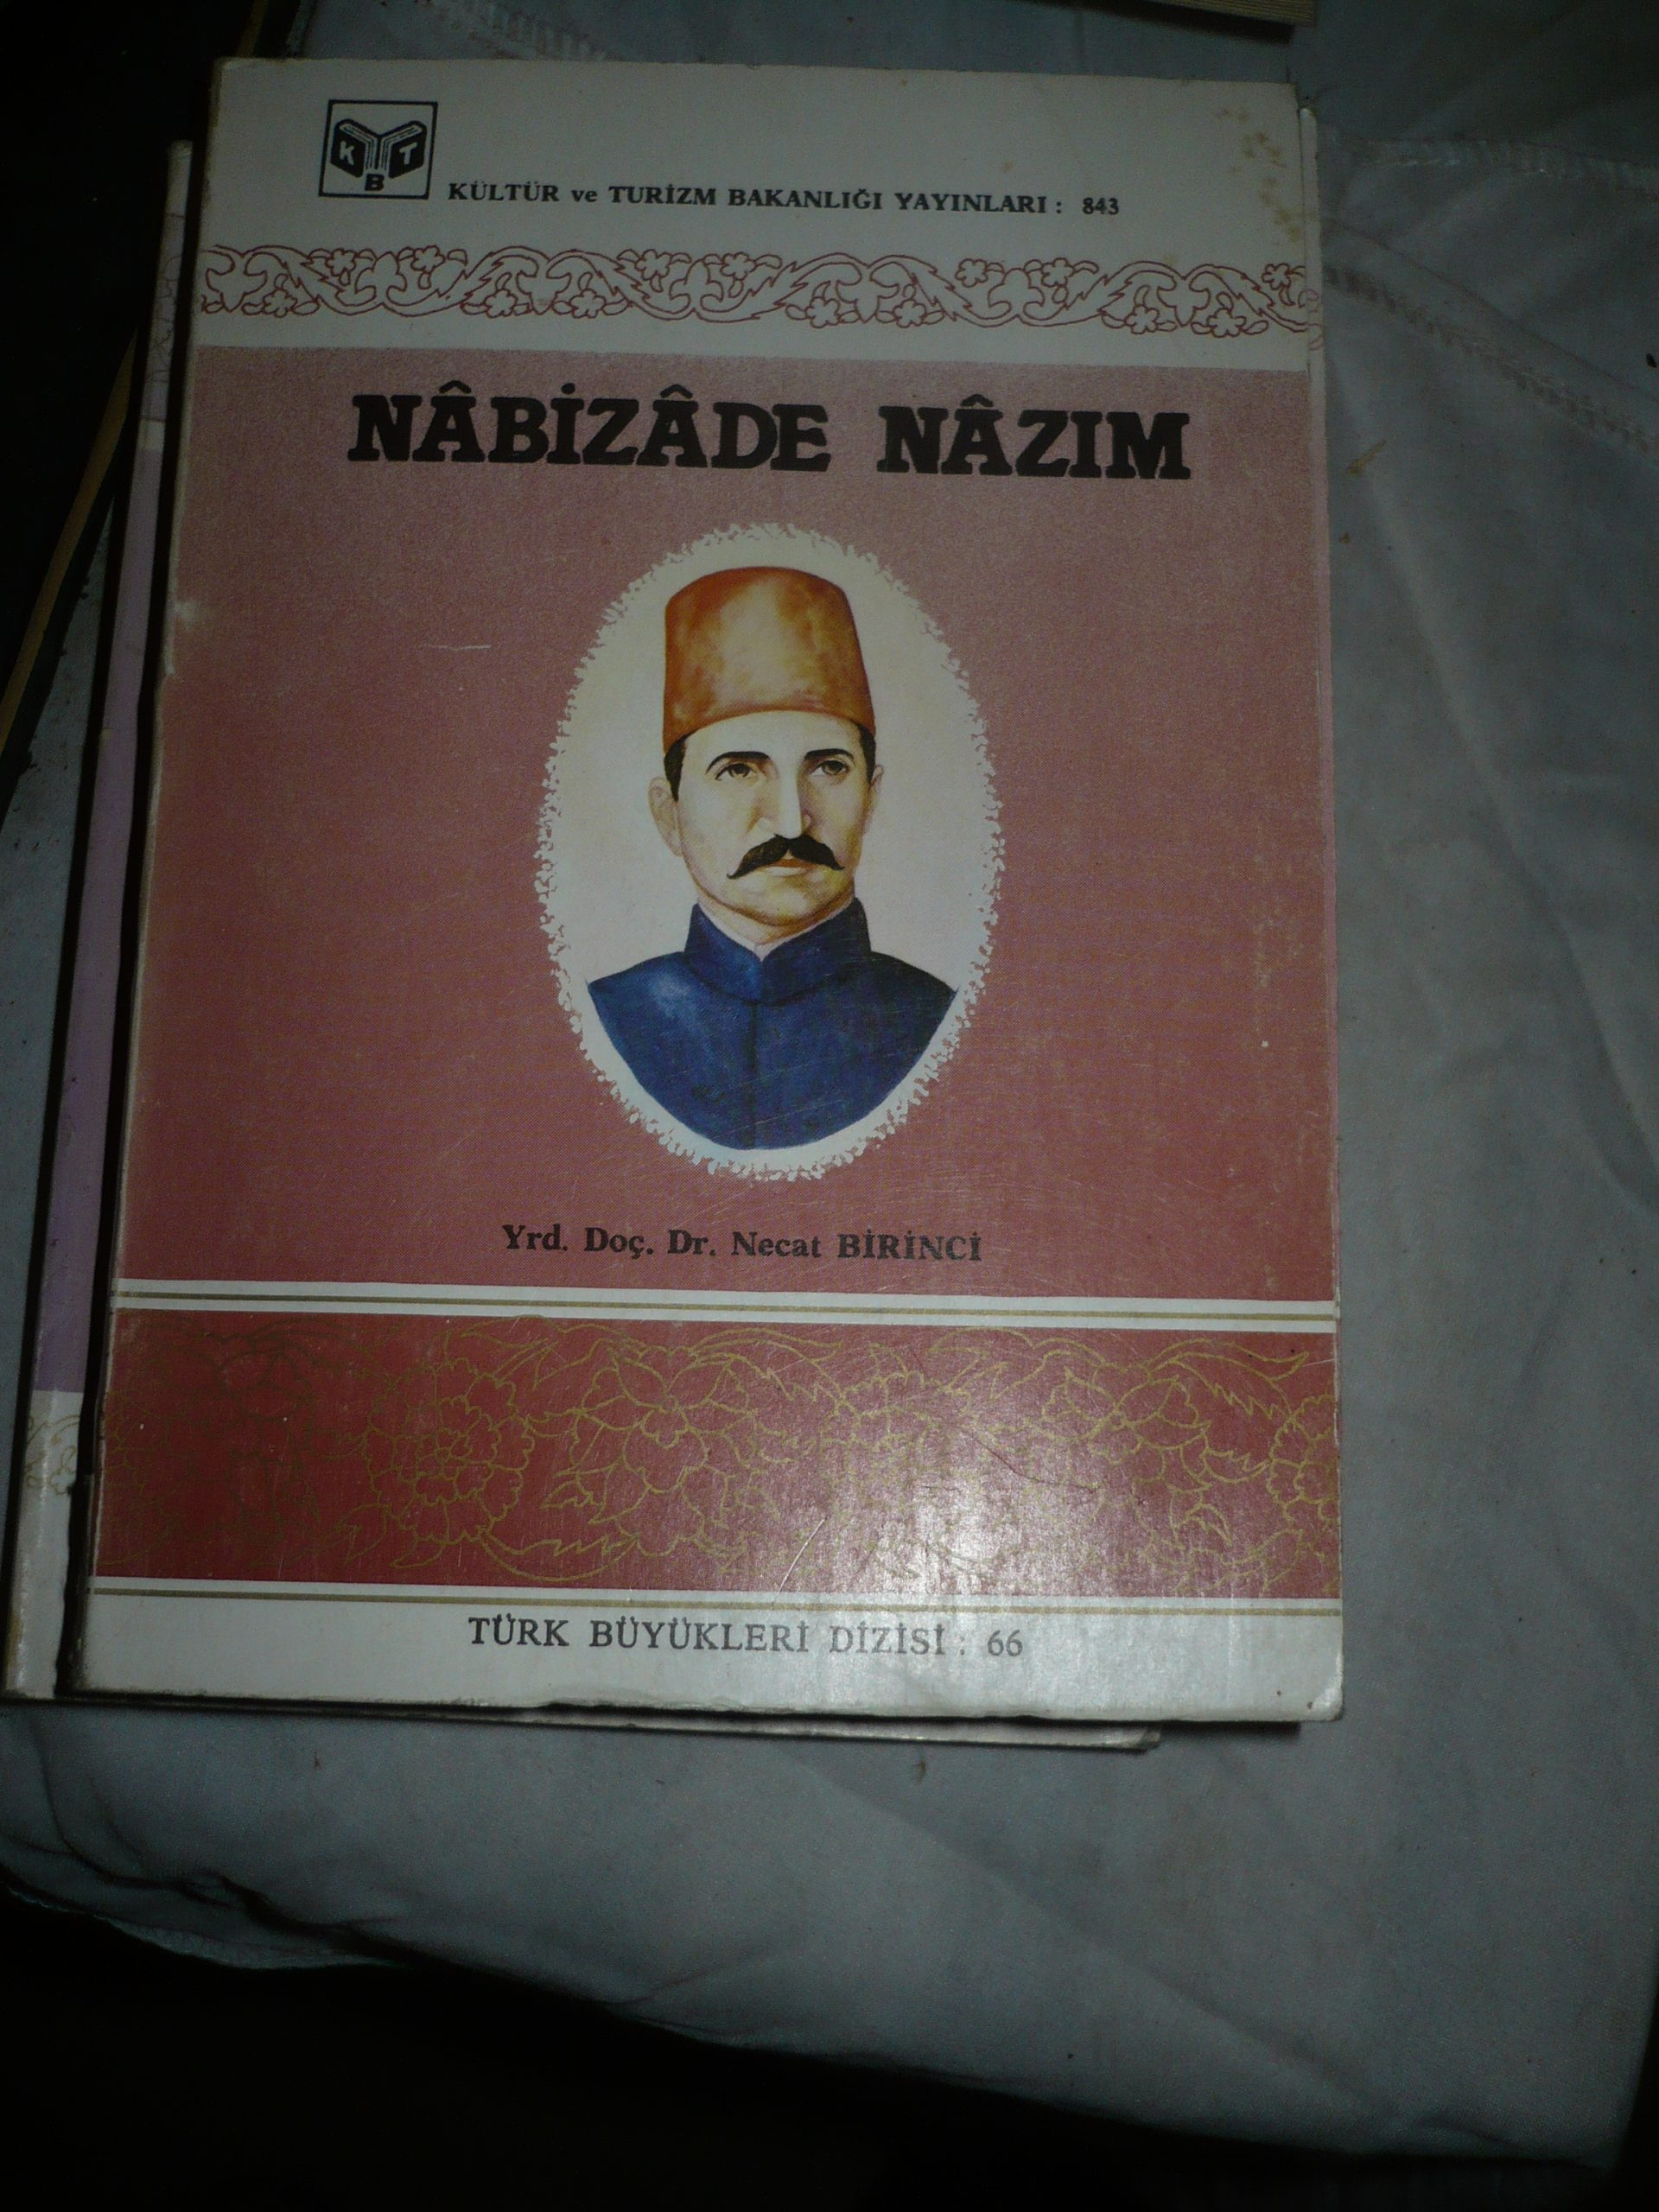 NABİZADE NAZIM/Necat BİRİNCİ/10 TL